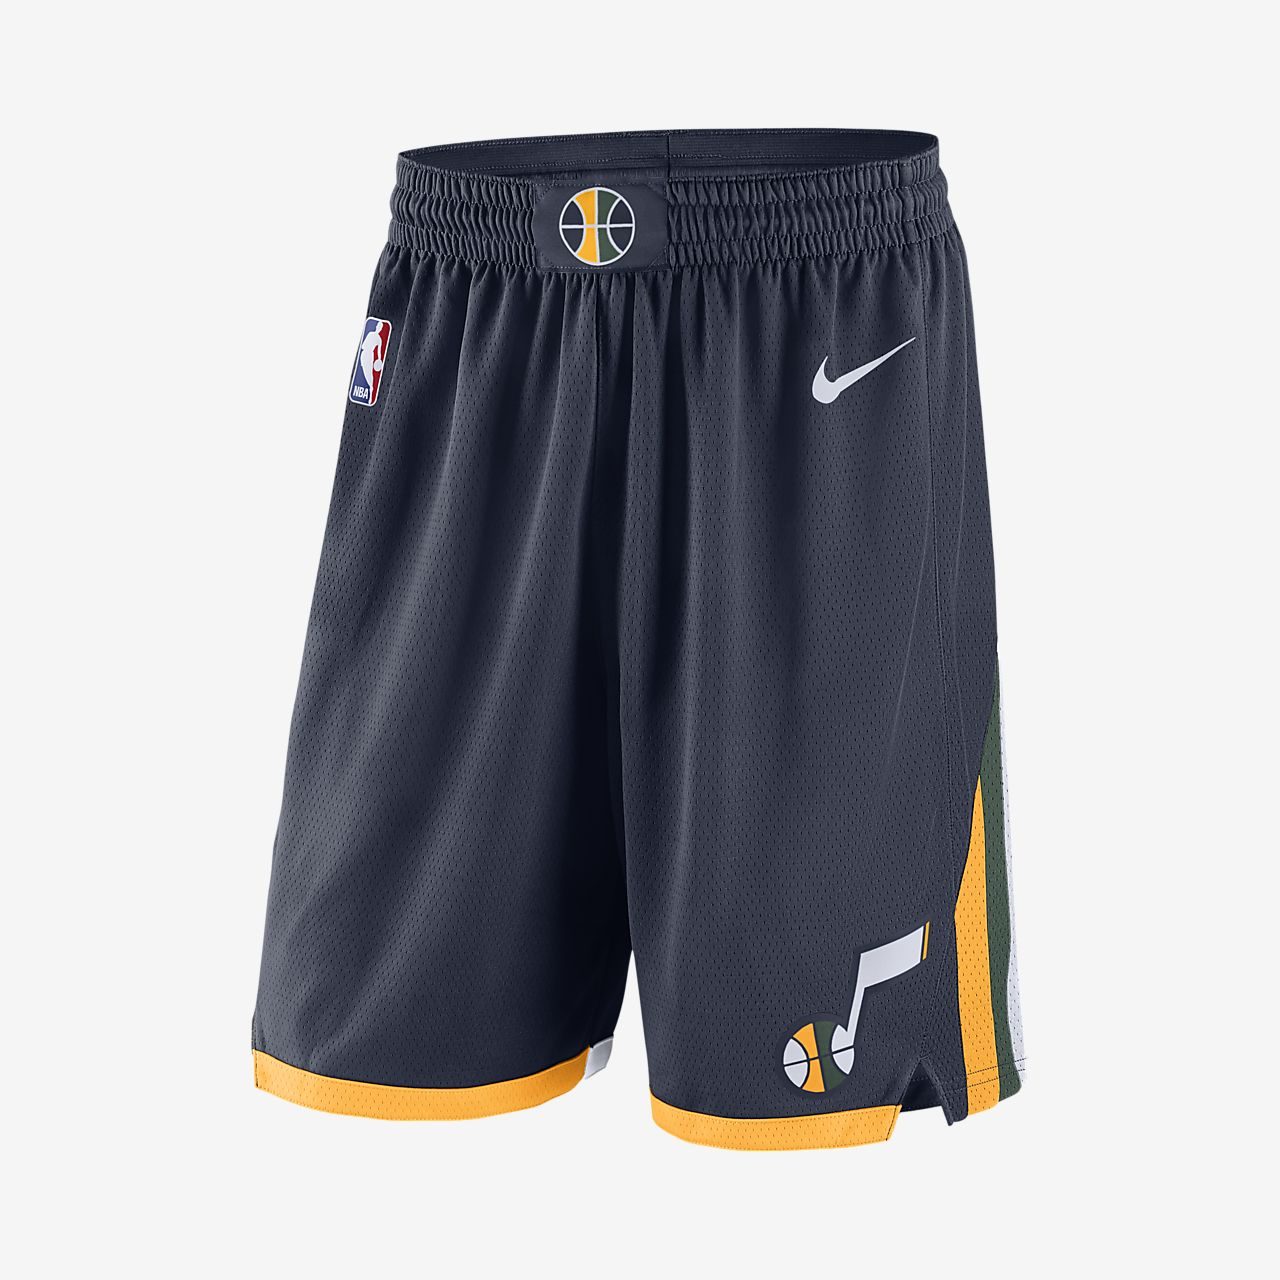 Shorts Utah Jazz Nike Icon Edition Swingman NBA för män